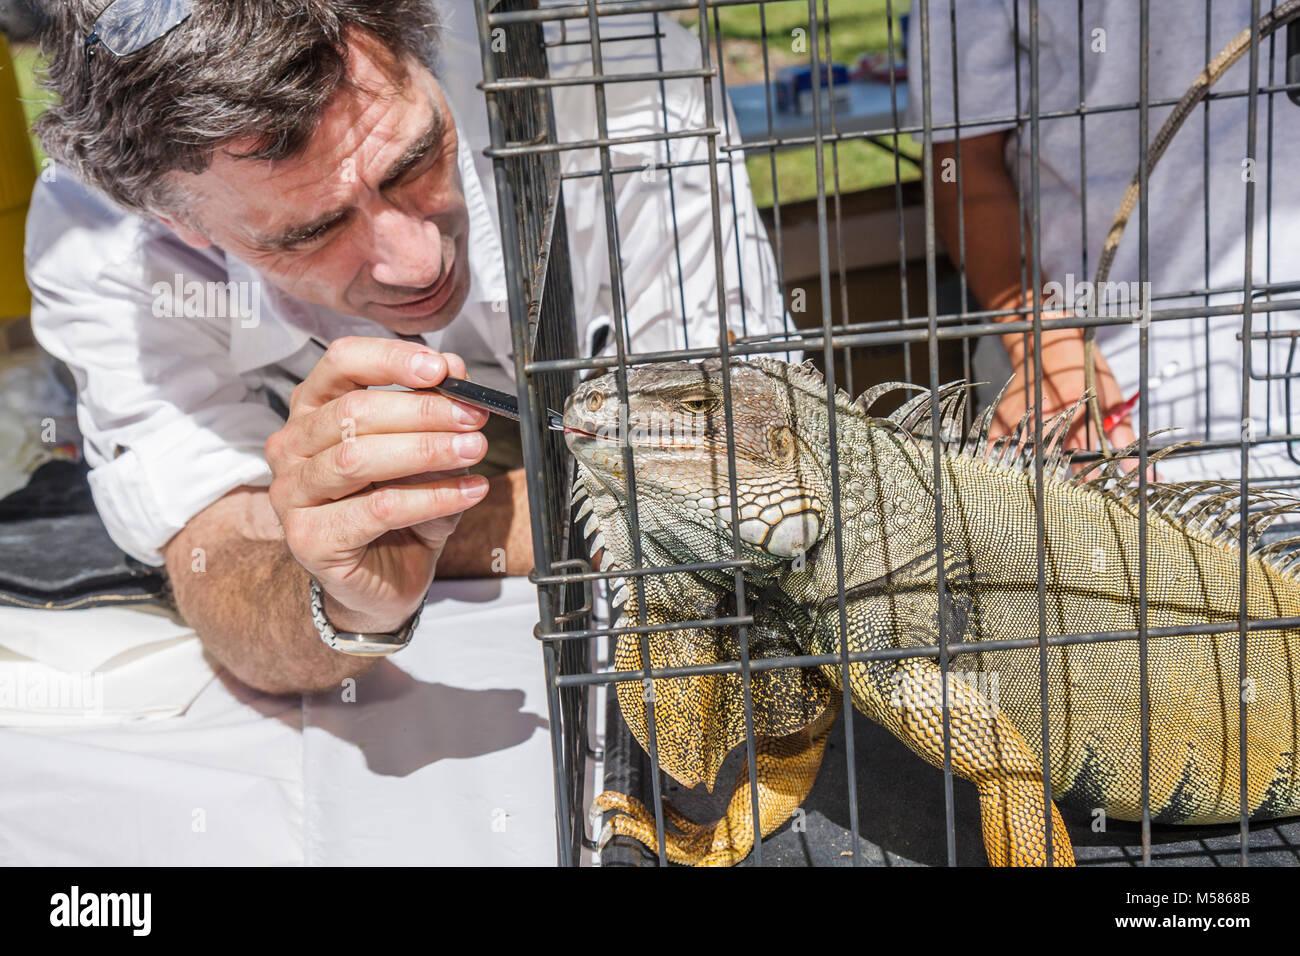 Miami Metrozoo Nonnative Pet Amnesty Day iguana veterinarian examine cage reptile - Stock Image